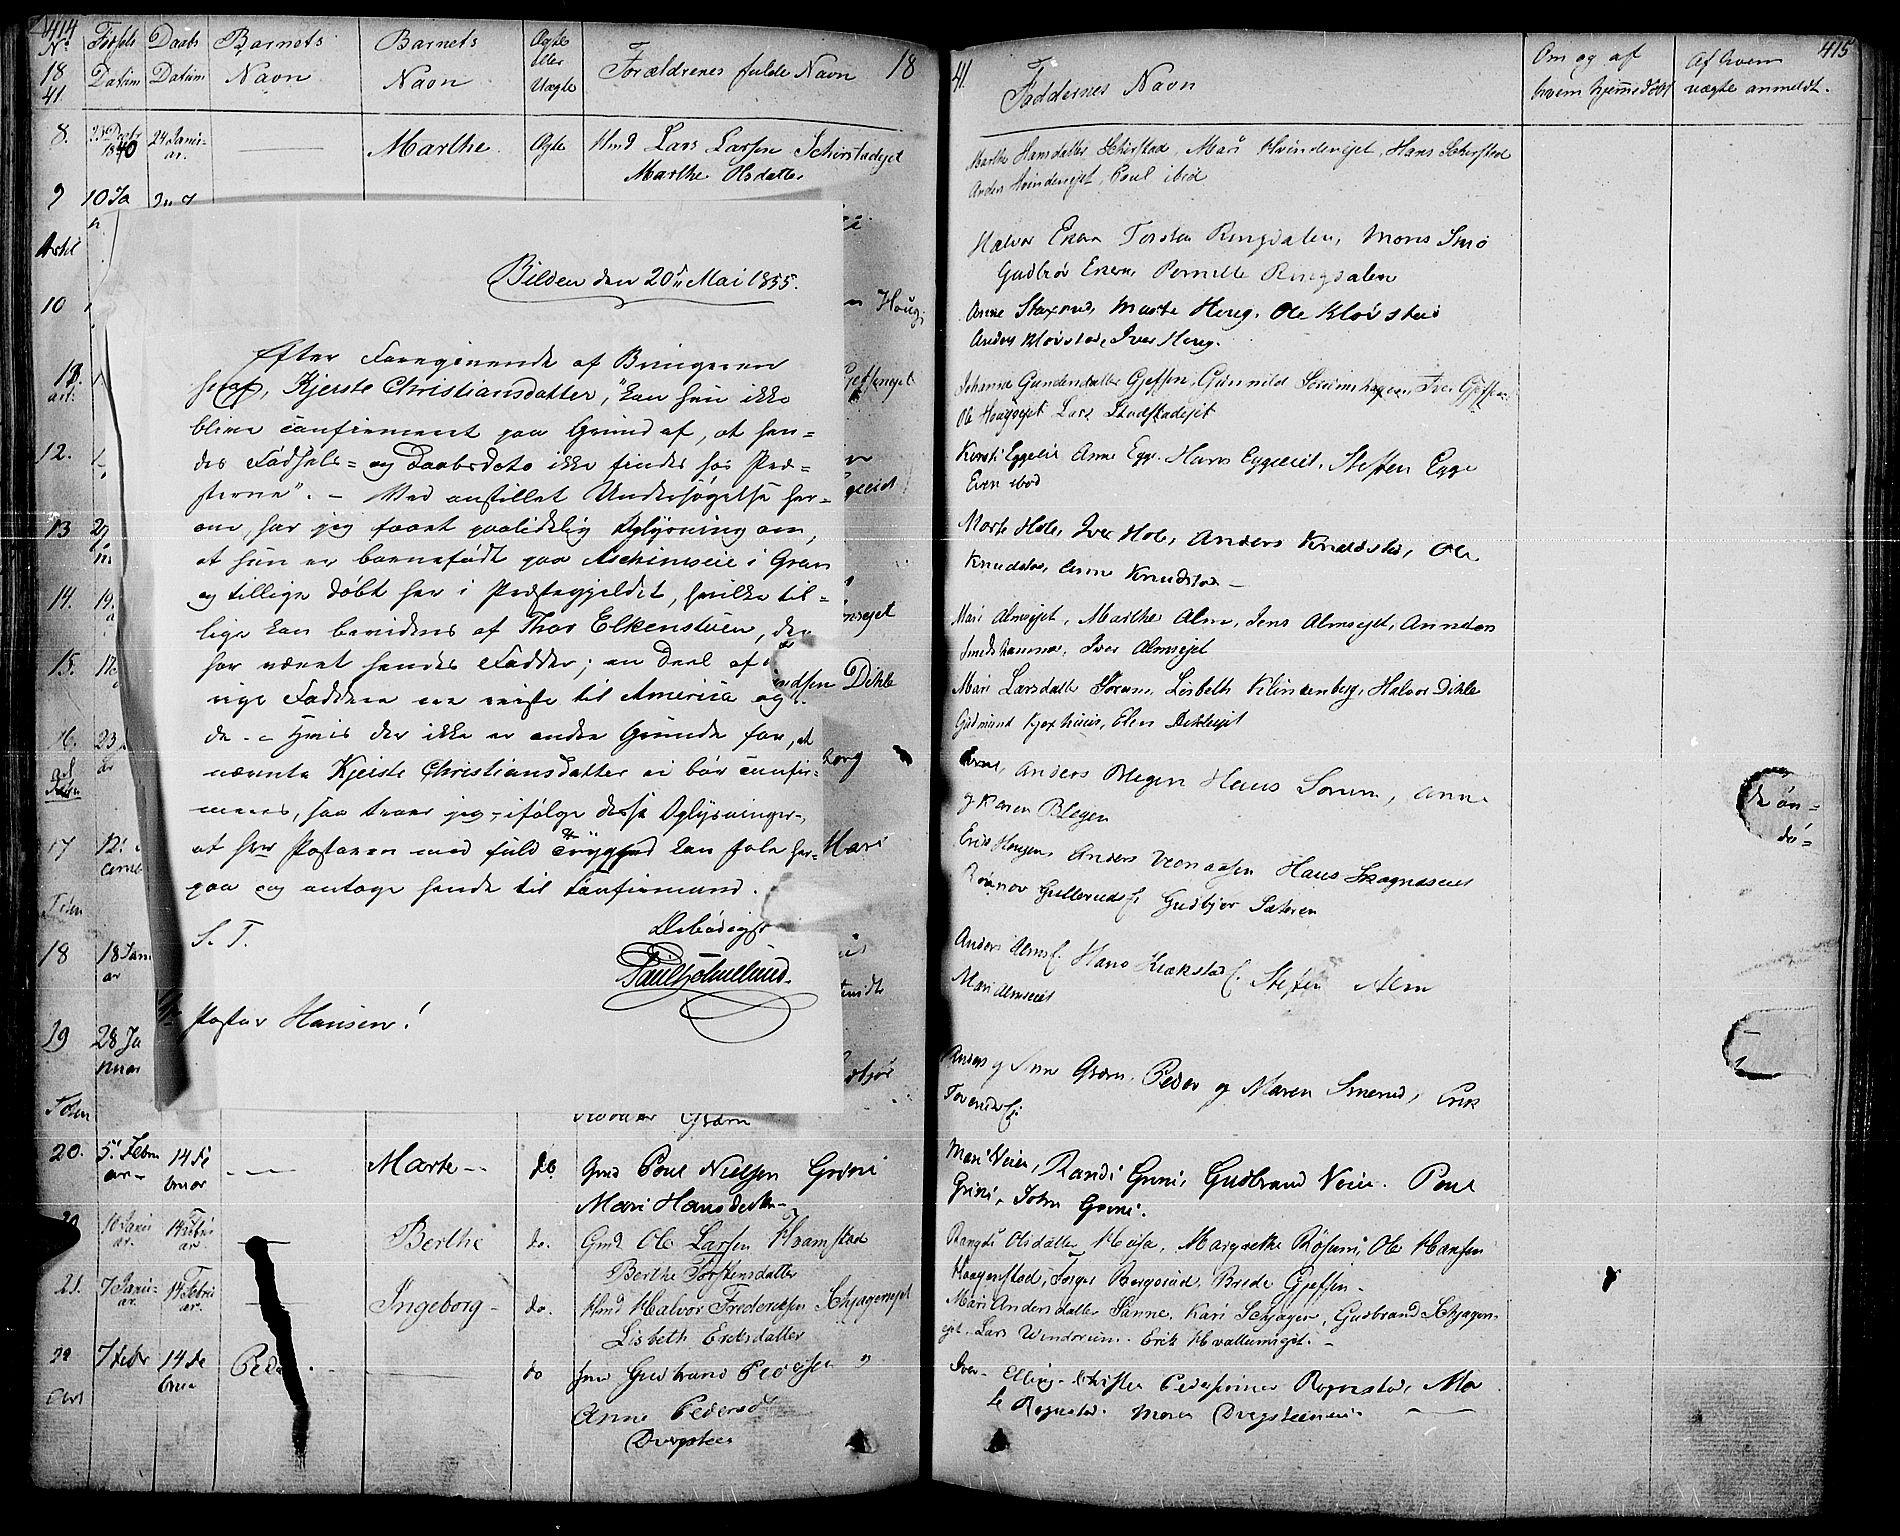 SAH, Gran prestekontor, Ministerialbok nr. 10, 1824-1842, s. 414-415